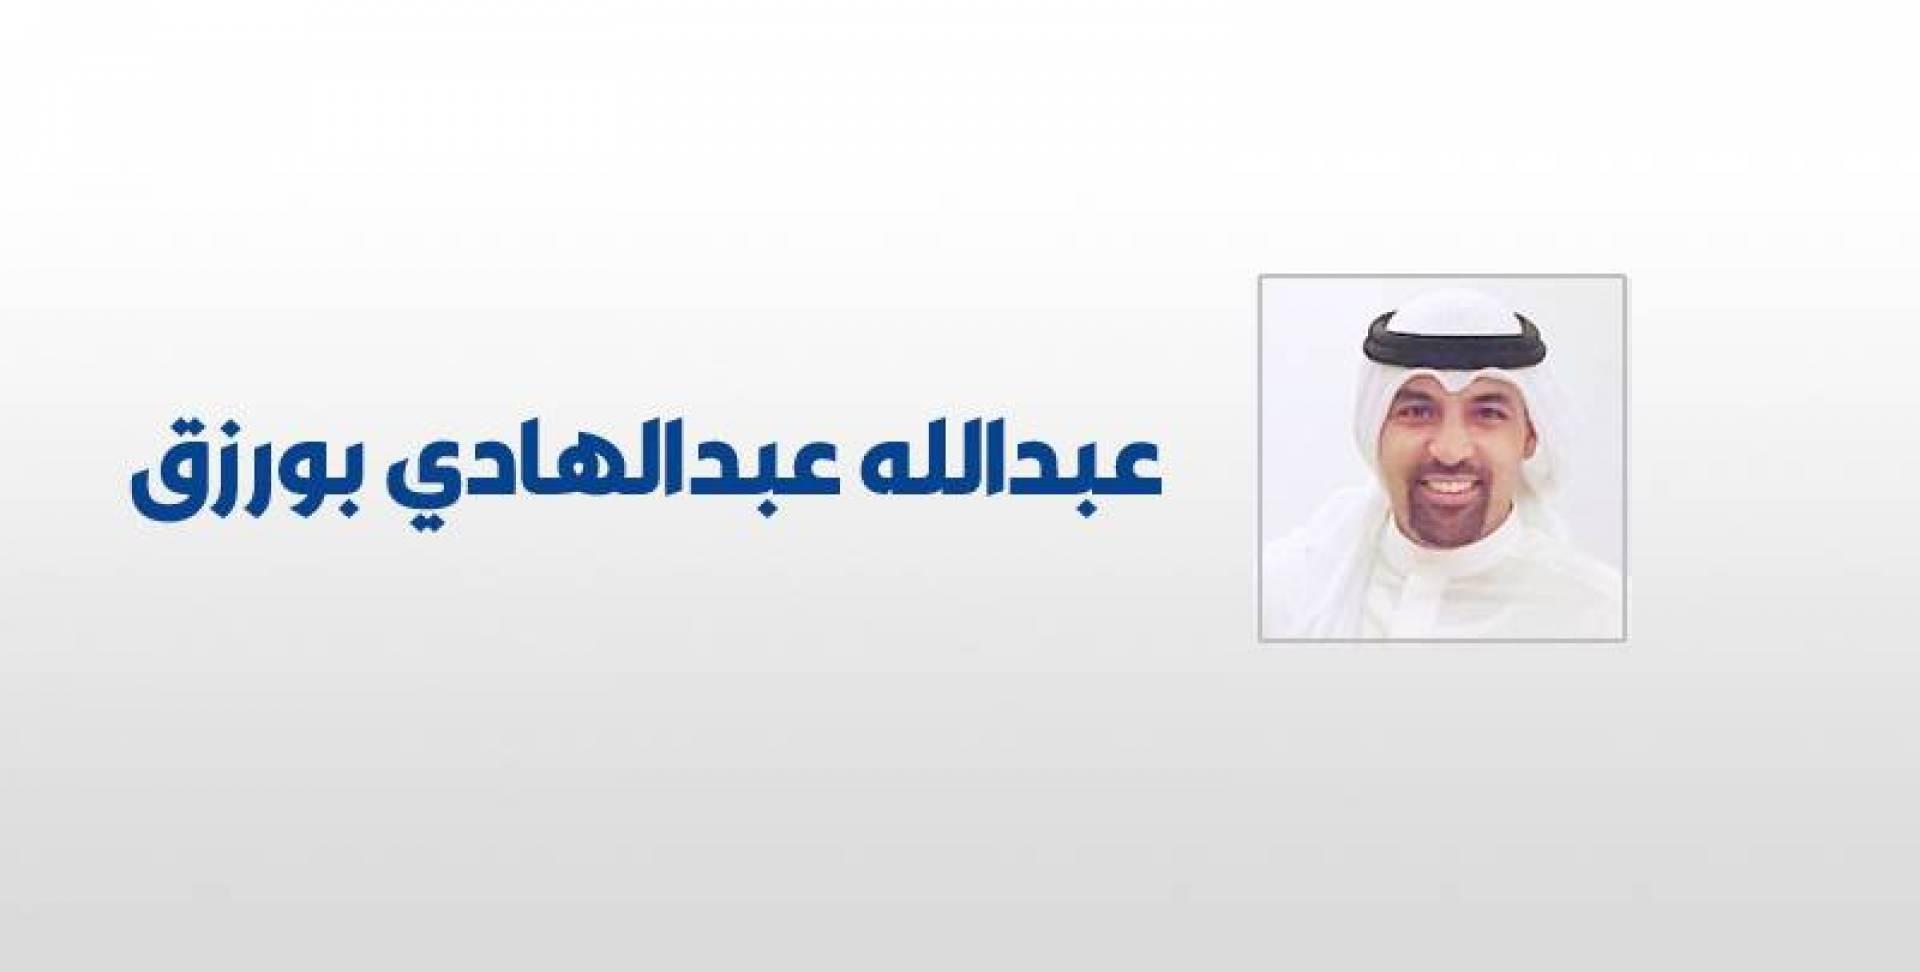 عبدالله عبدالهادي بورزق